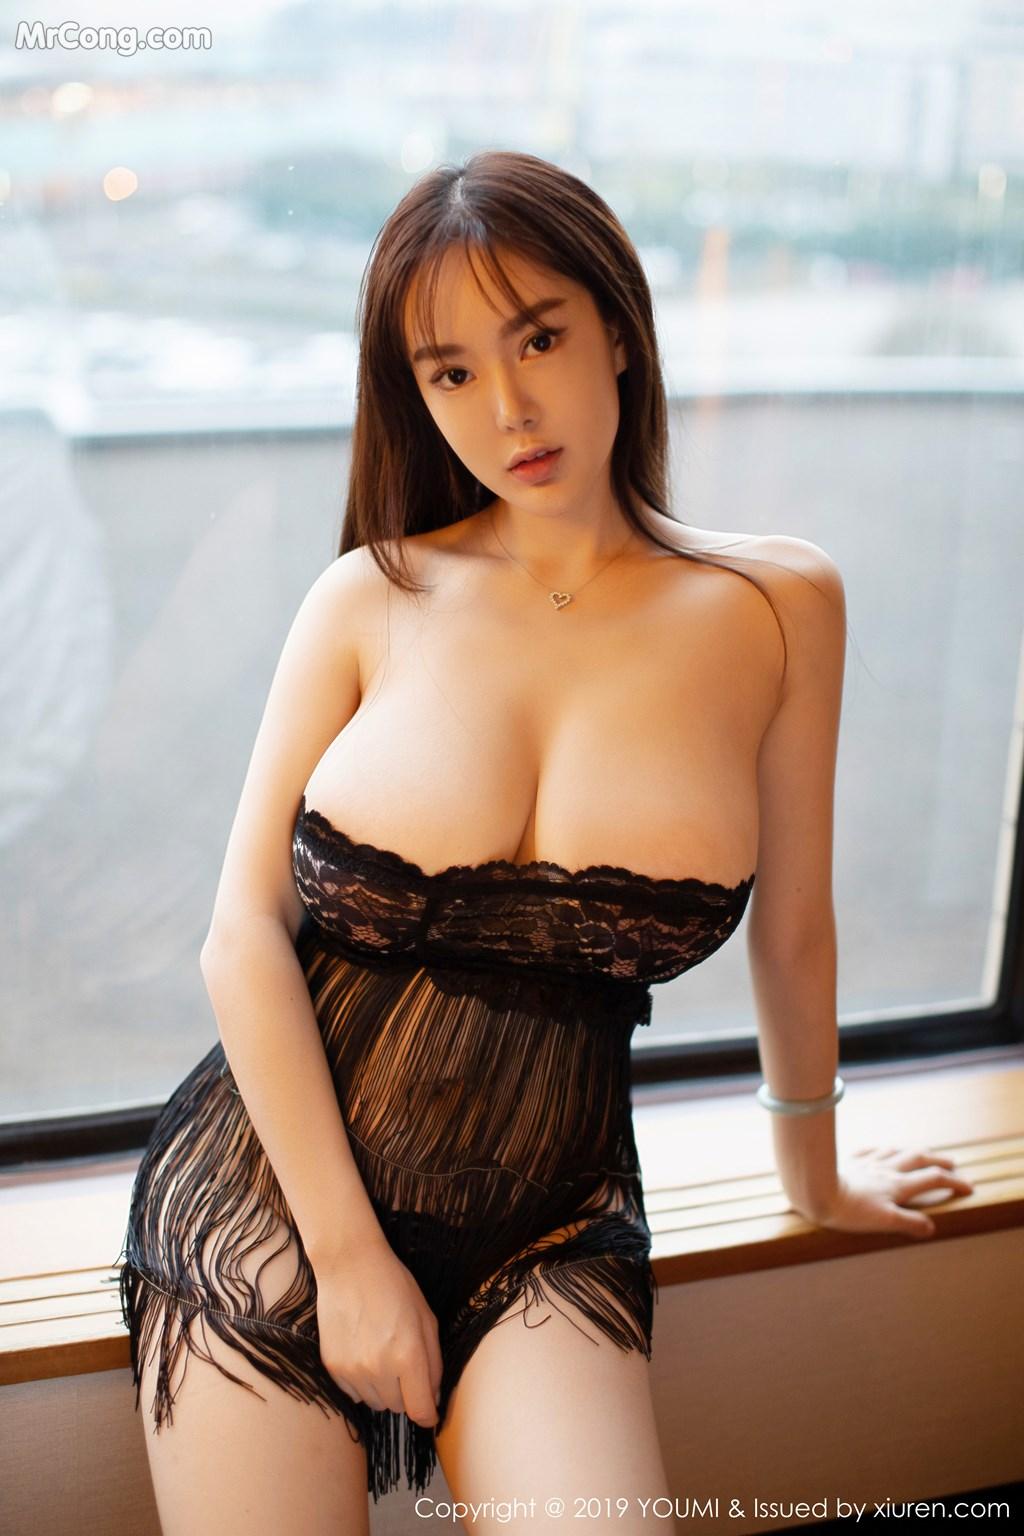 YouMi Vol.311: 易陽Silvia - 貼圖 - 清涼寫真 -